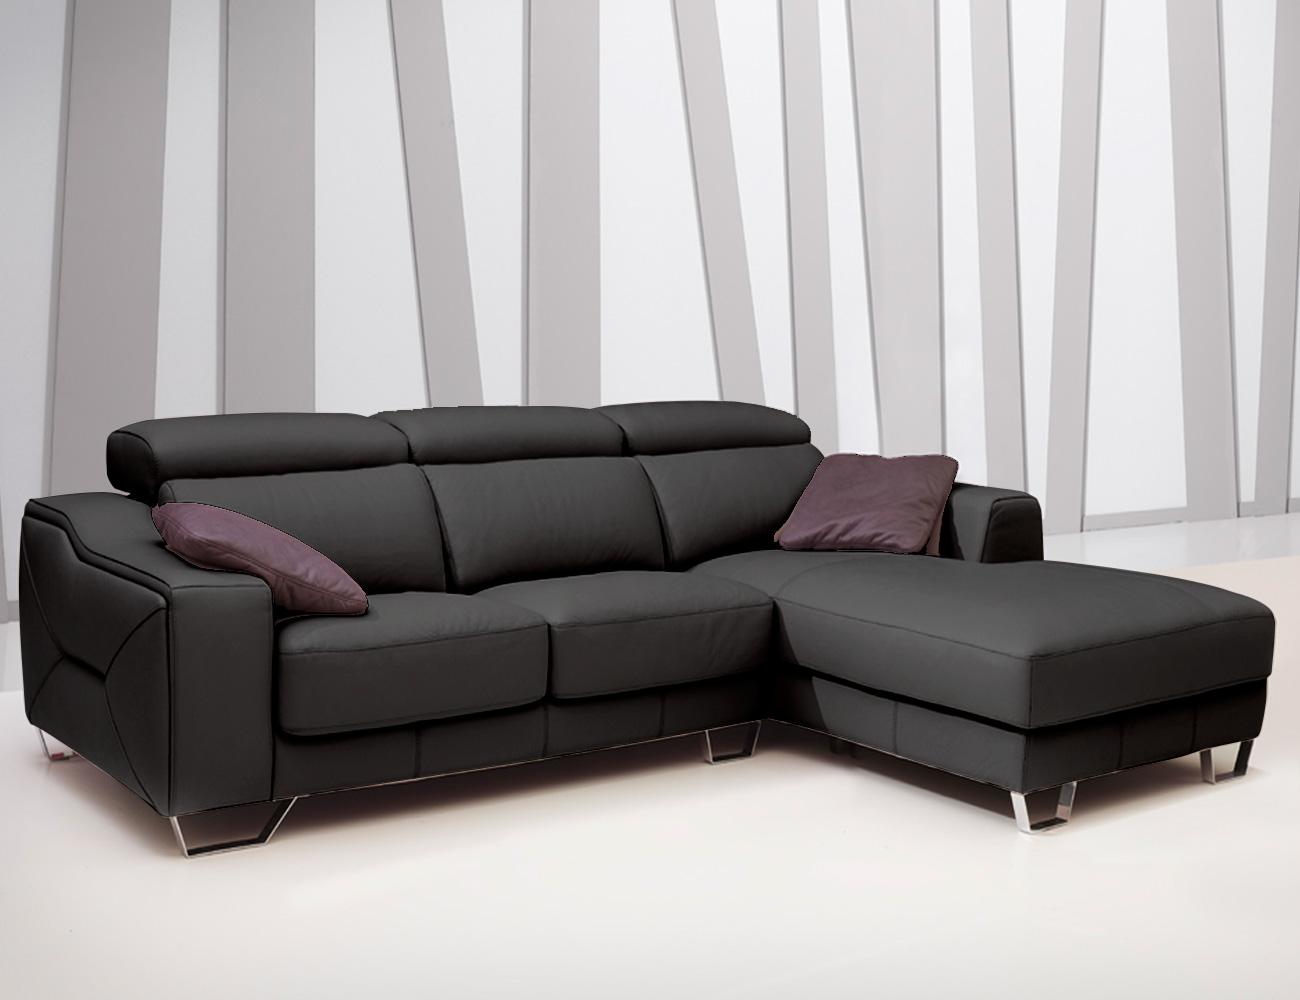 Sofa chaiselongue pedro ortiz piel espesorada antracita 1